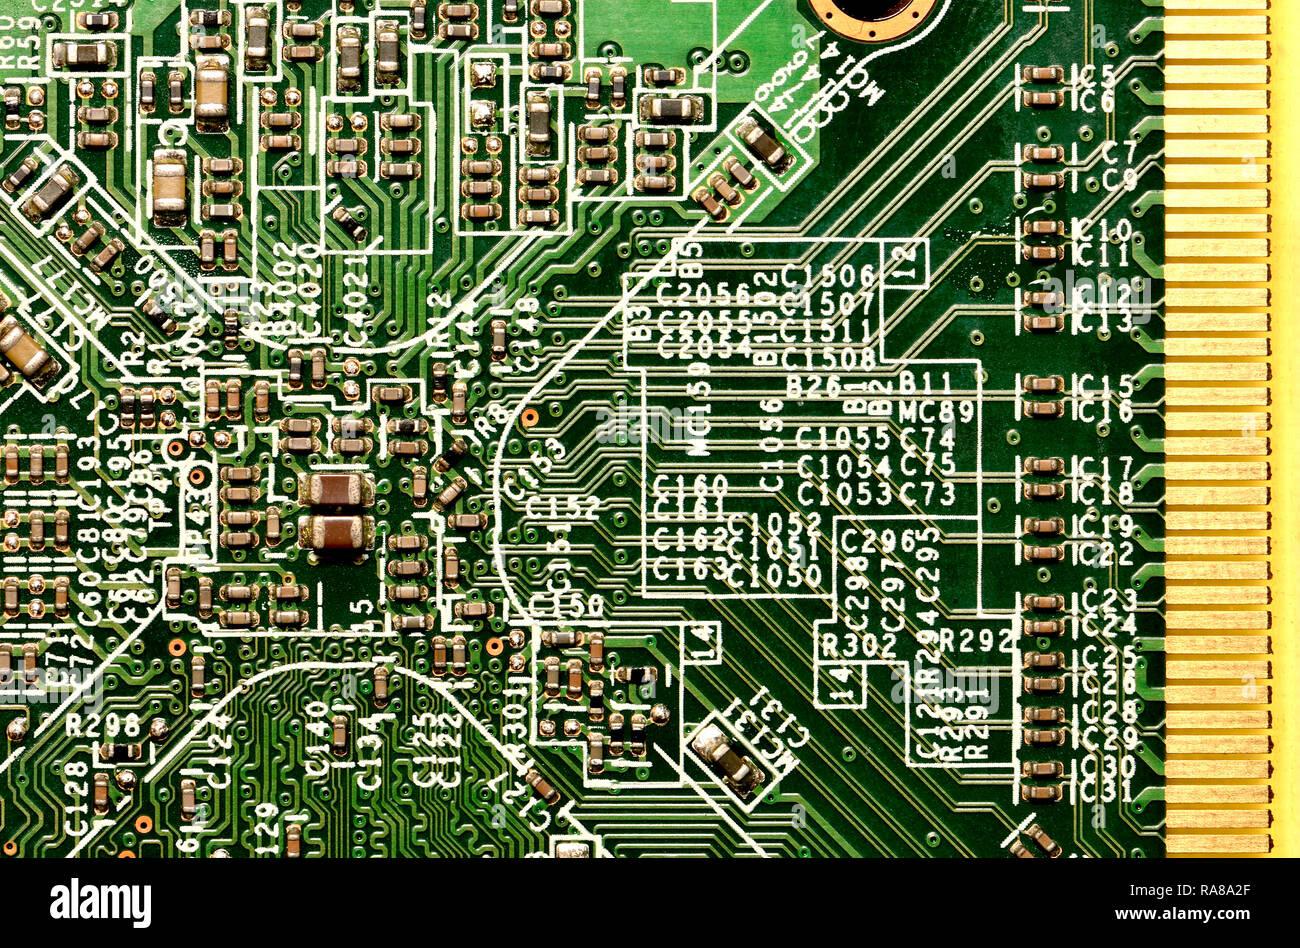 Computer Graphics Card - Detail Stockbild